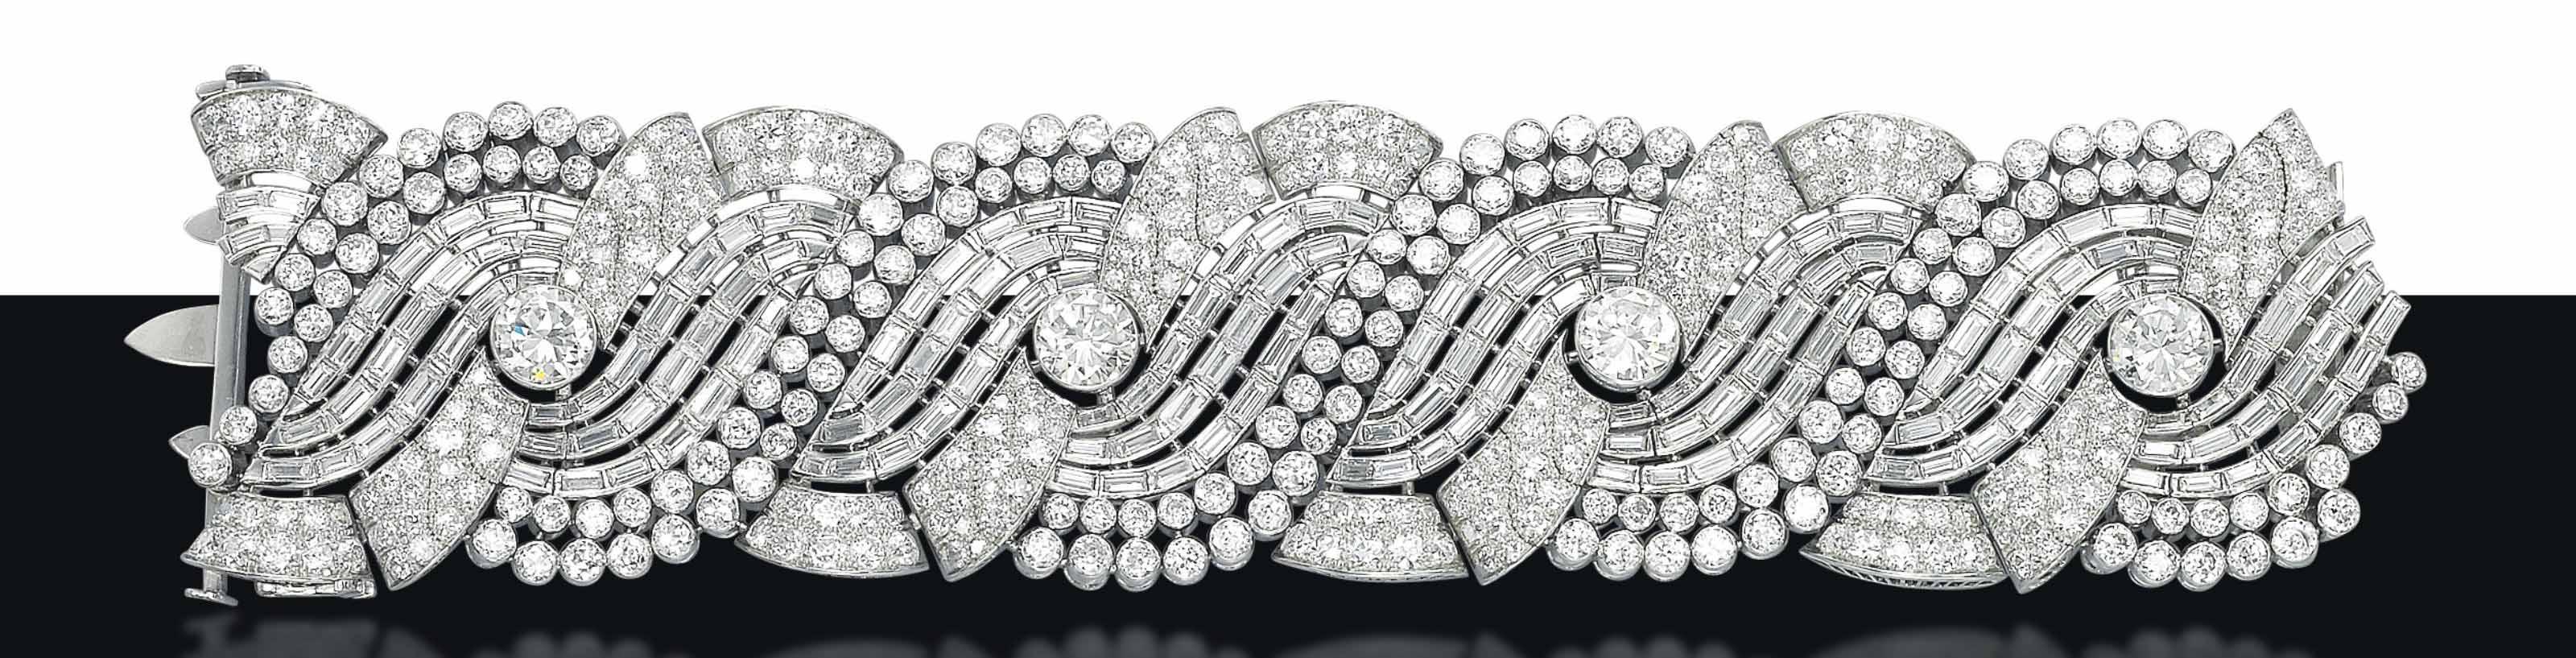 AN IMPRESSIVE ART DECO DIAMOND BRACELET